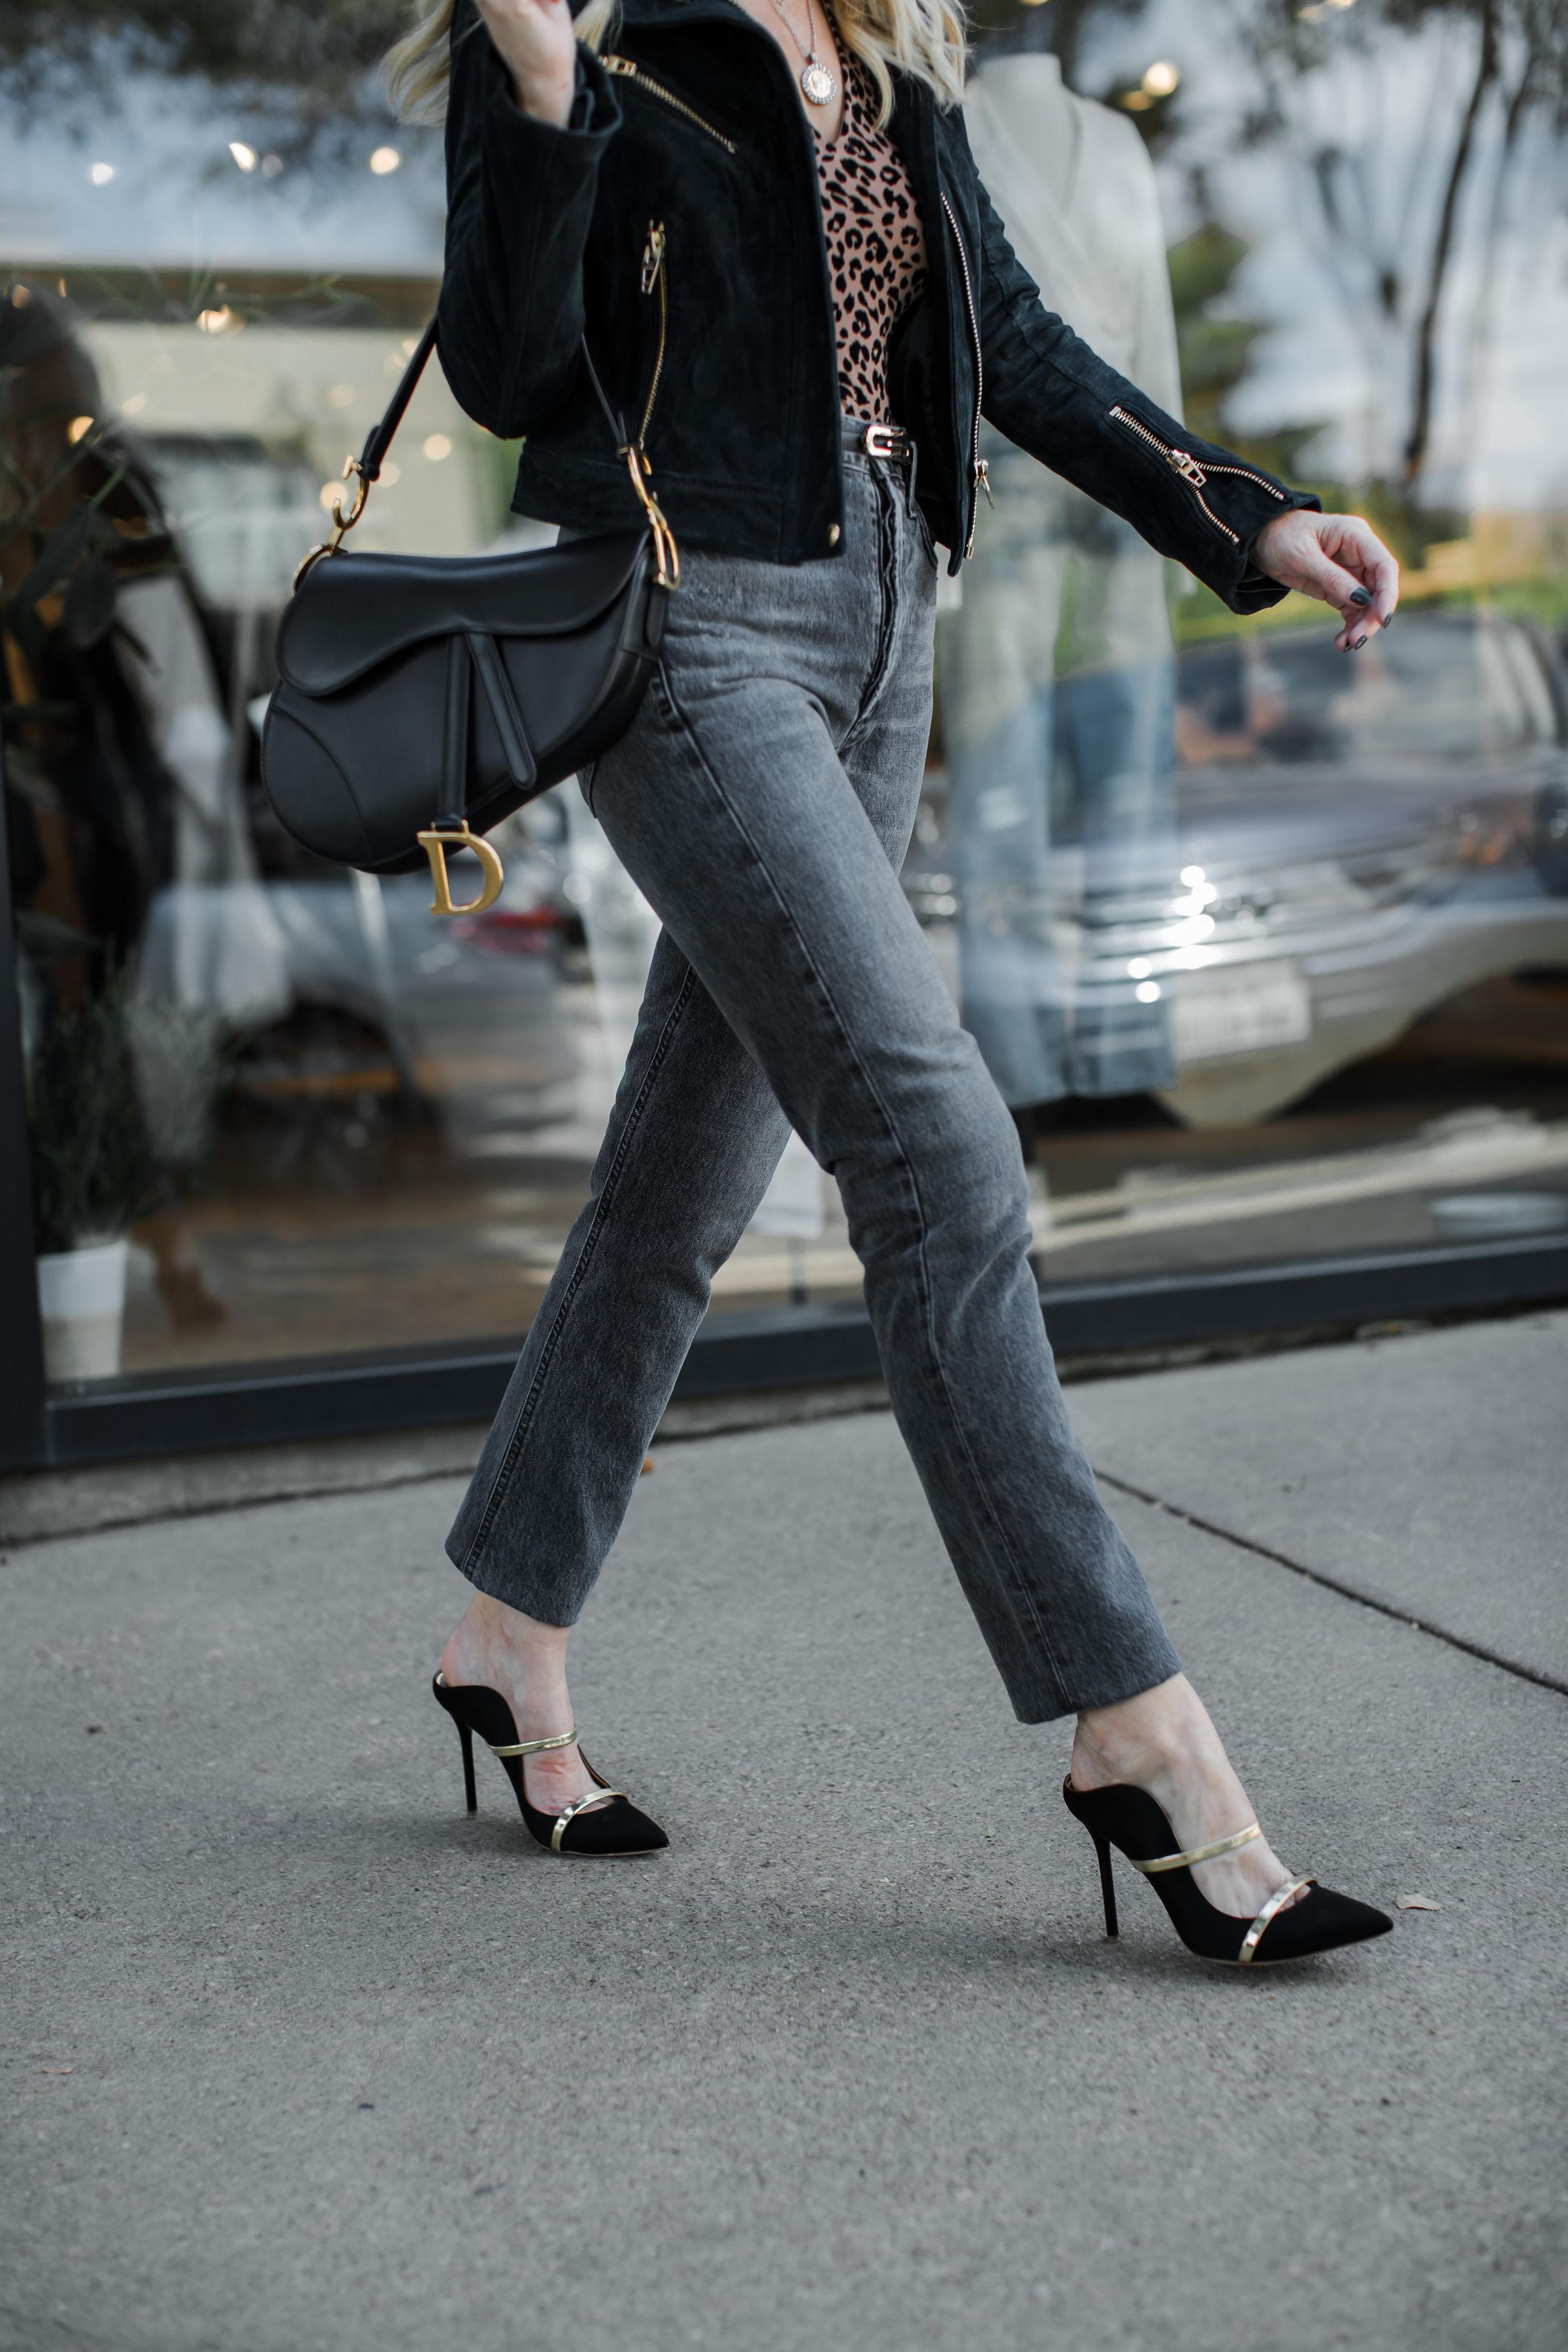 Dallas Fashion Blogger Carrying A Dior Saddle Bag